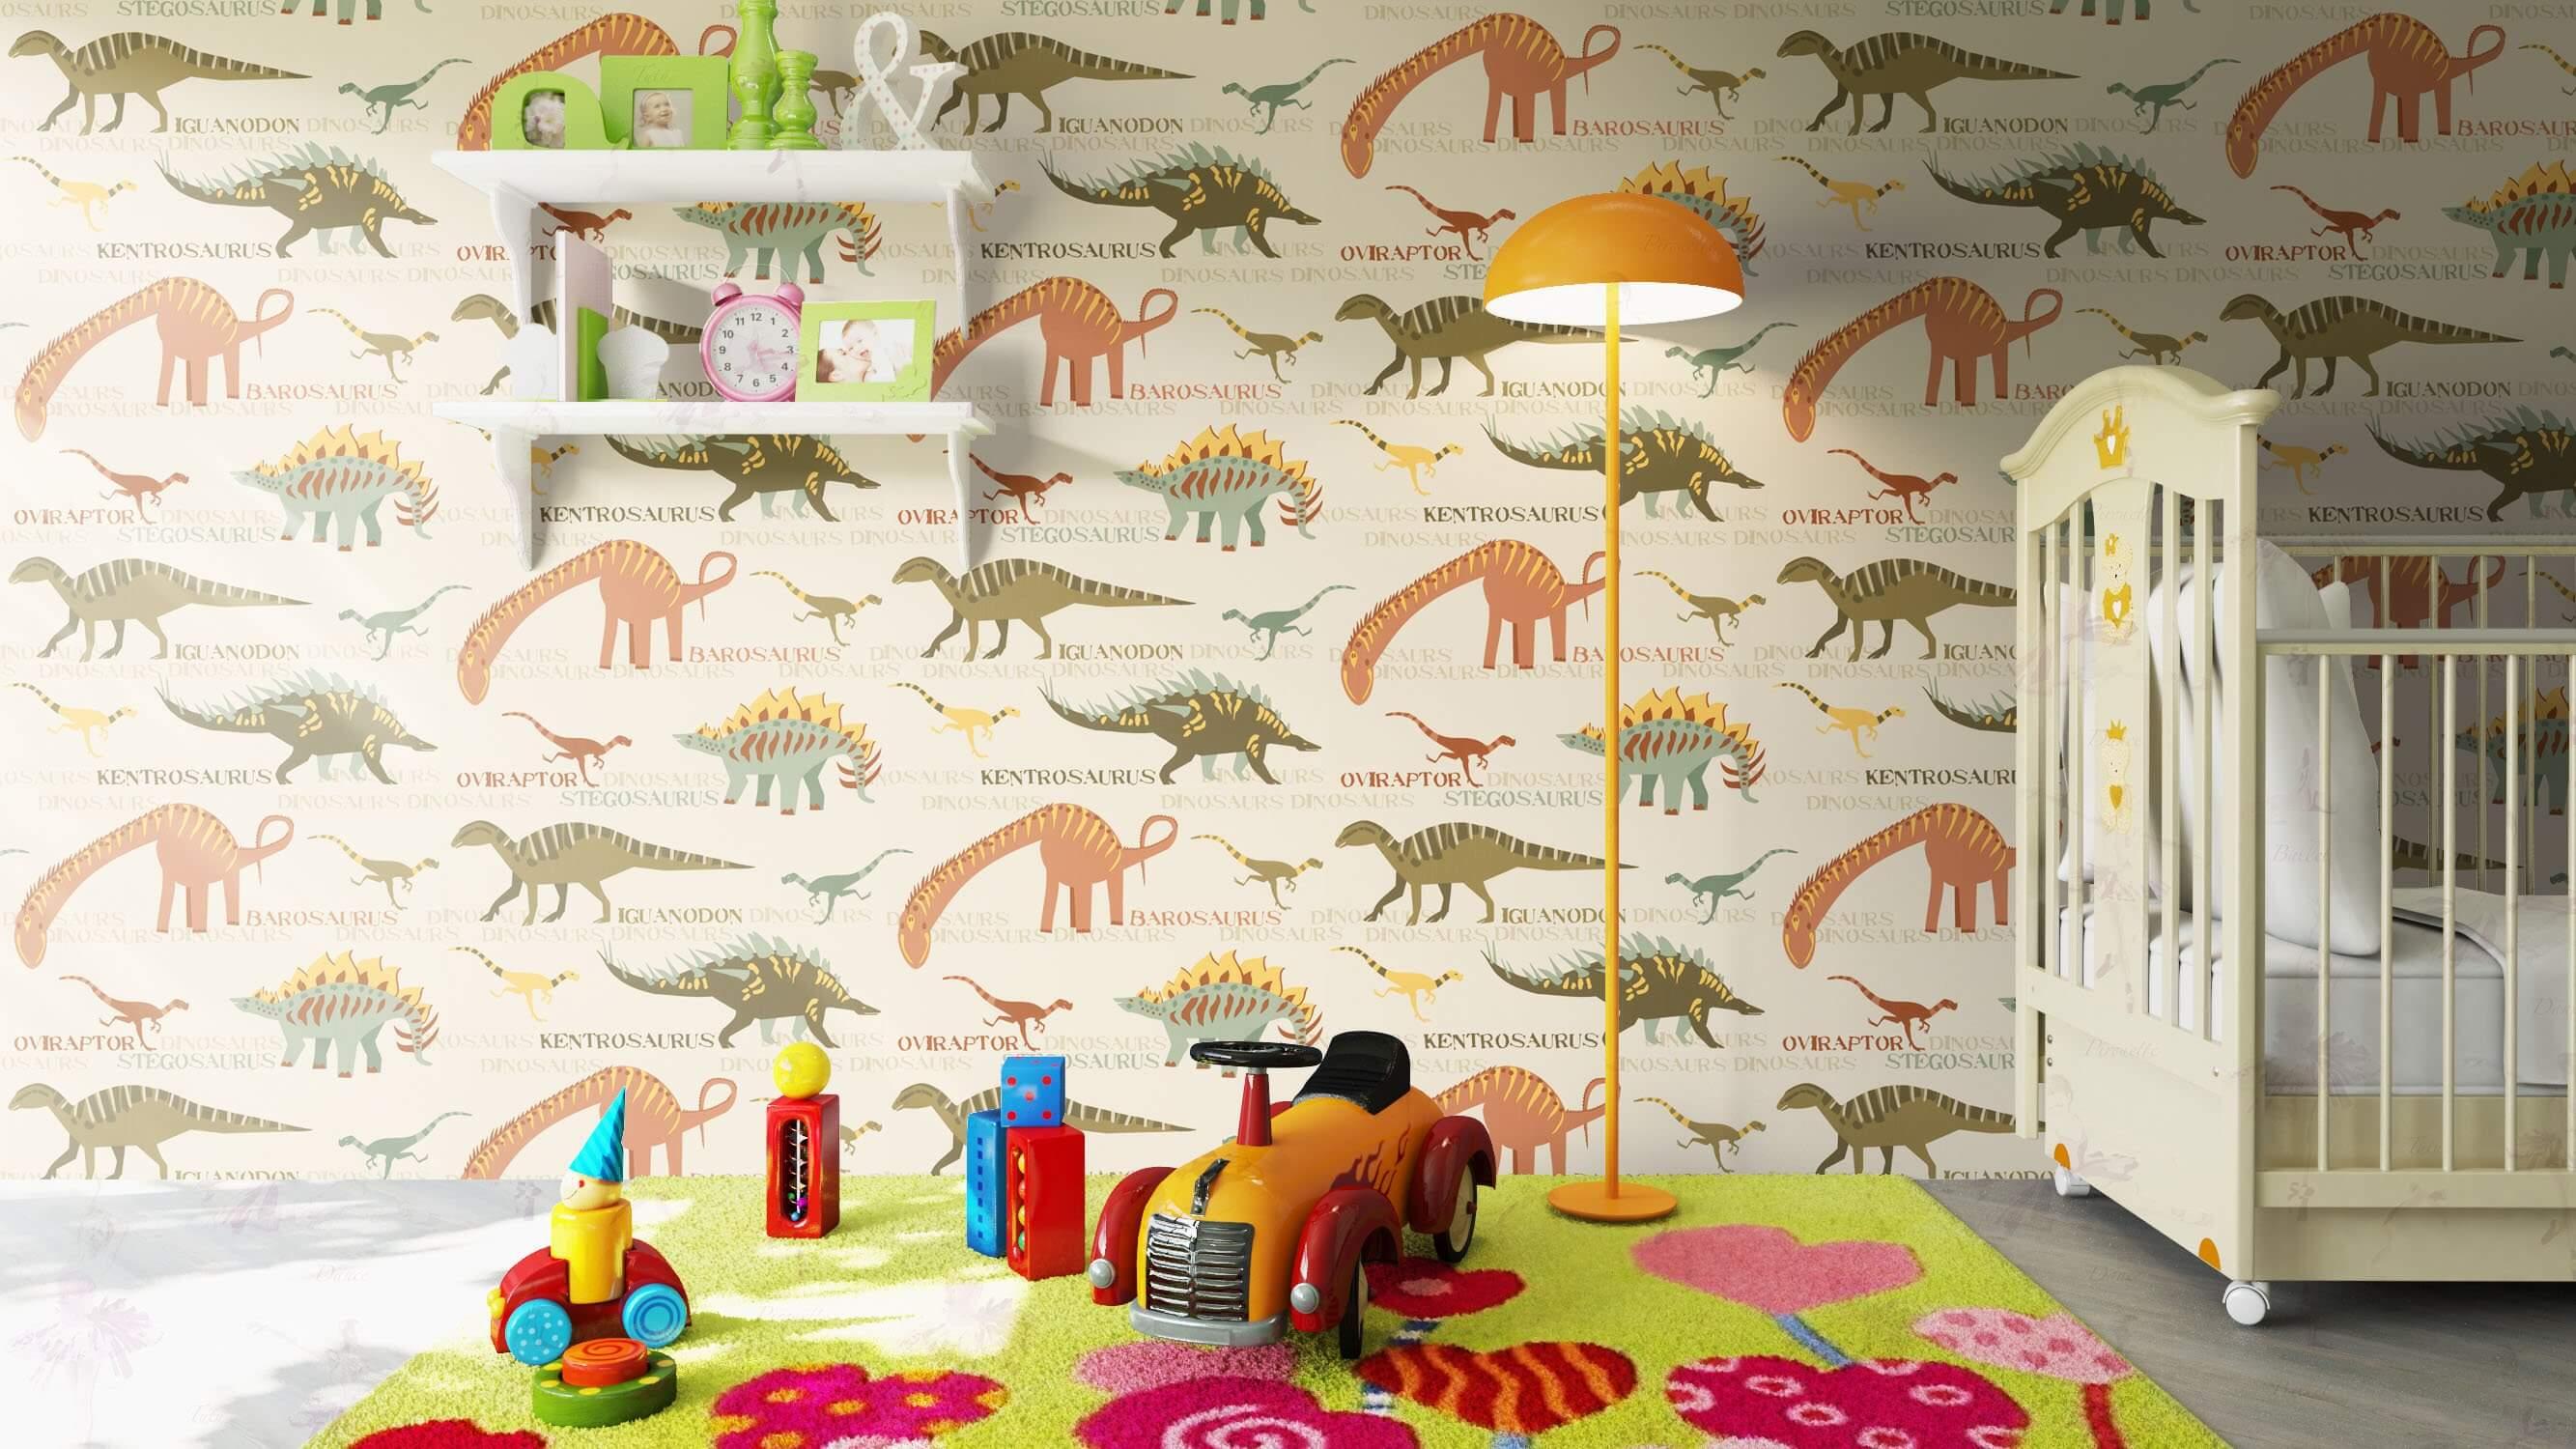 dino kinderzimmer tapete 1 - Tapete Dinosaurier